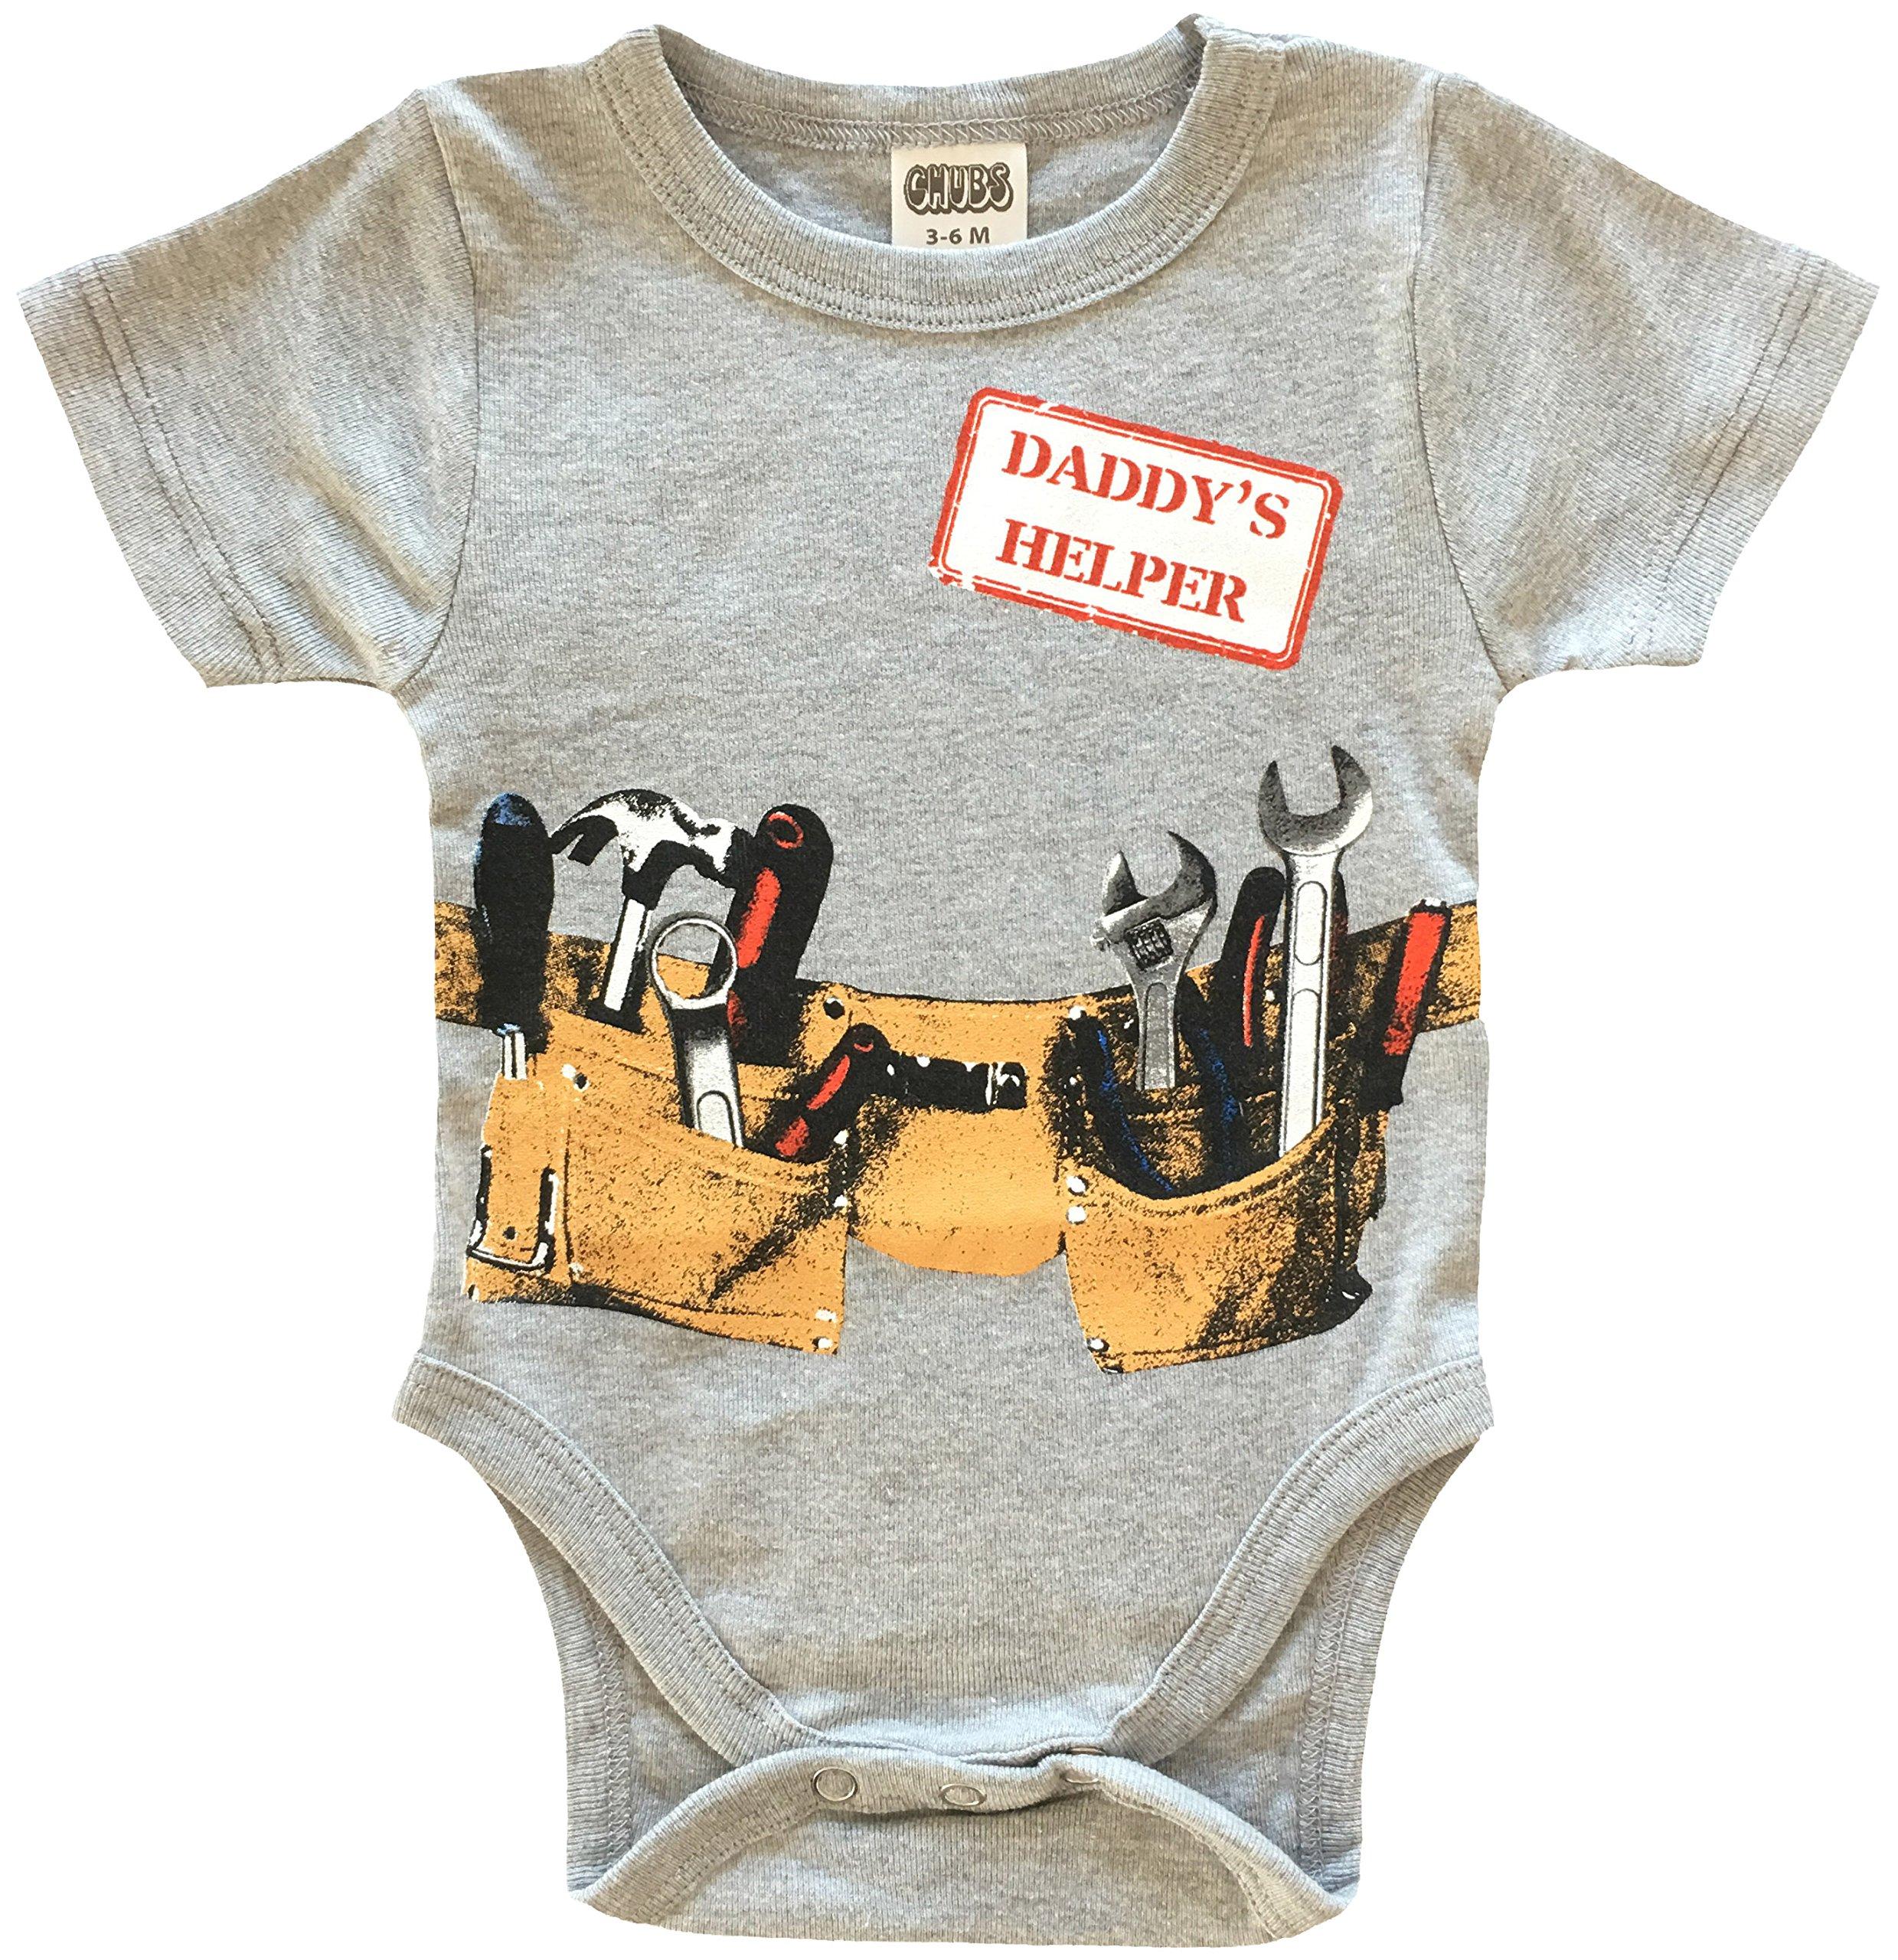 Daddys Little Helper Cute Boy Baby Clothes, Funny Baby Bodysuit (3-6M)